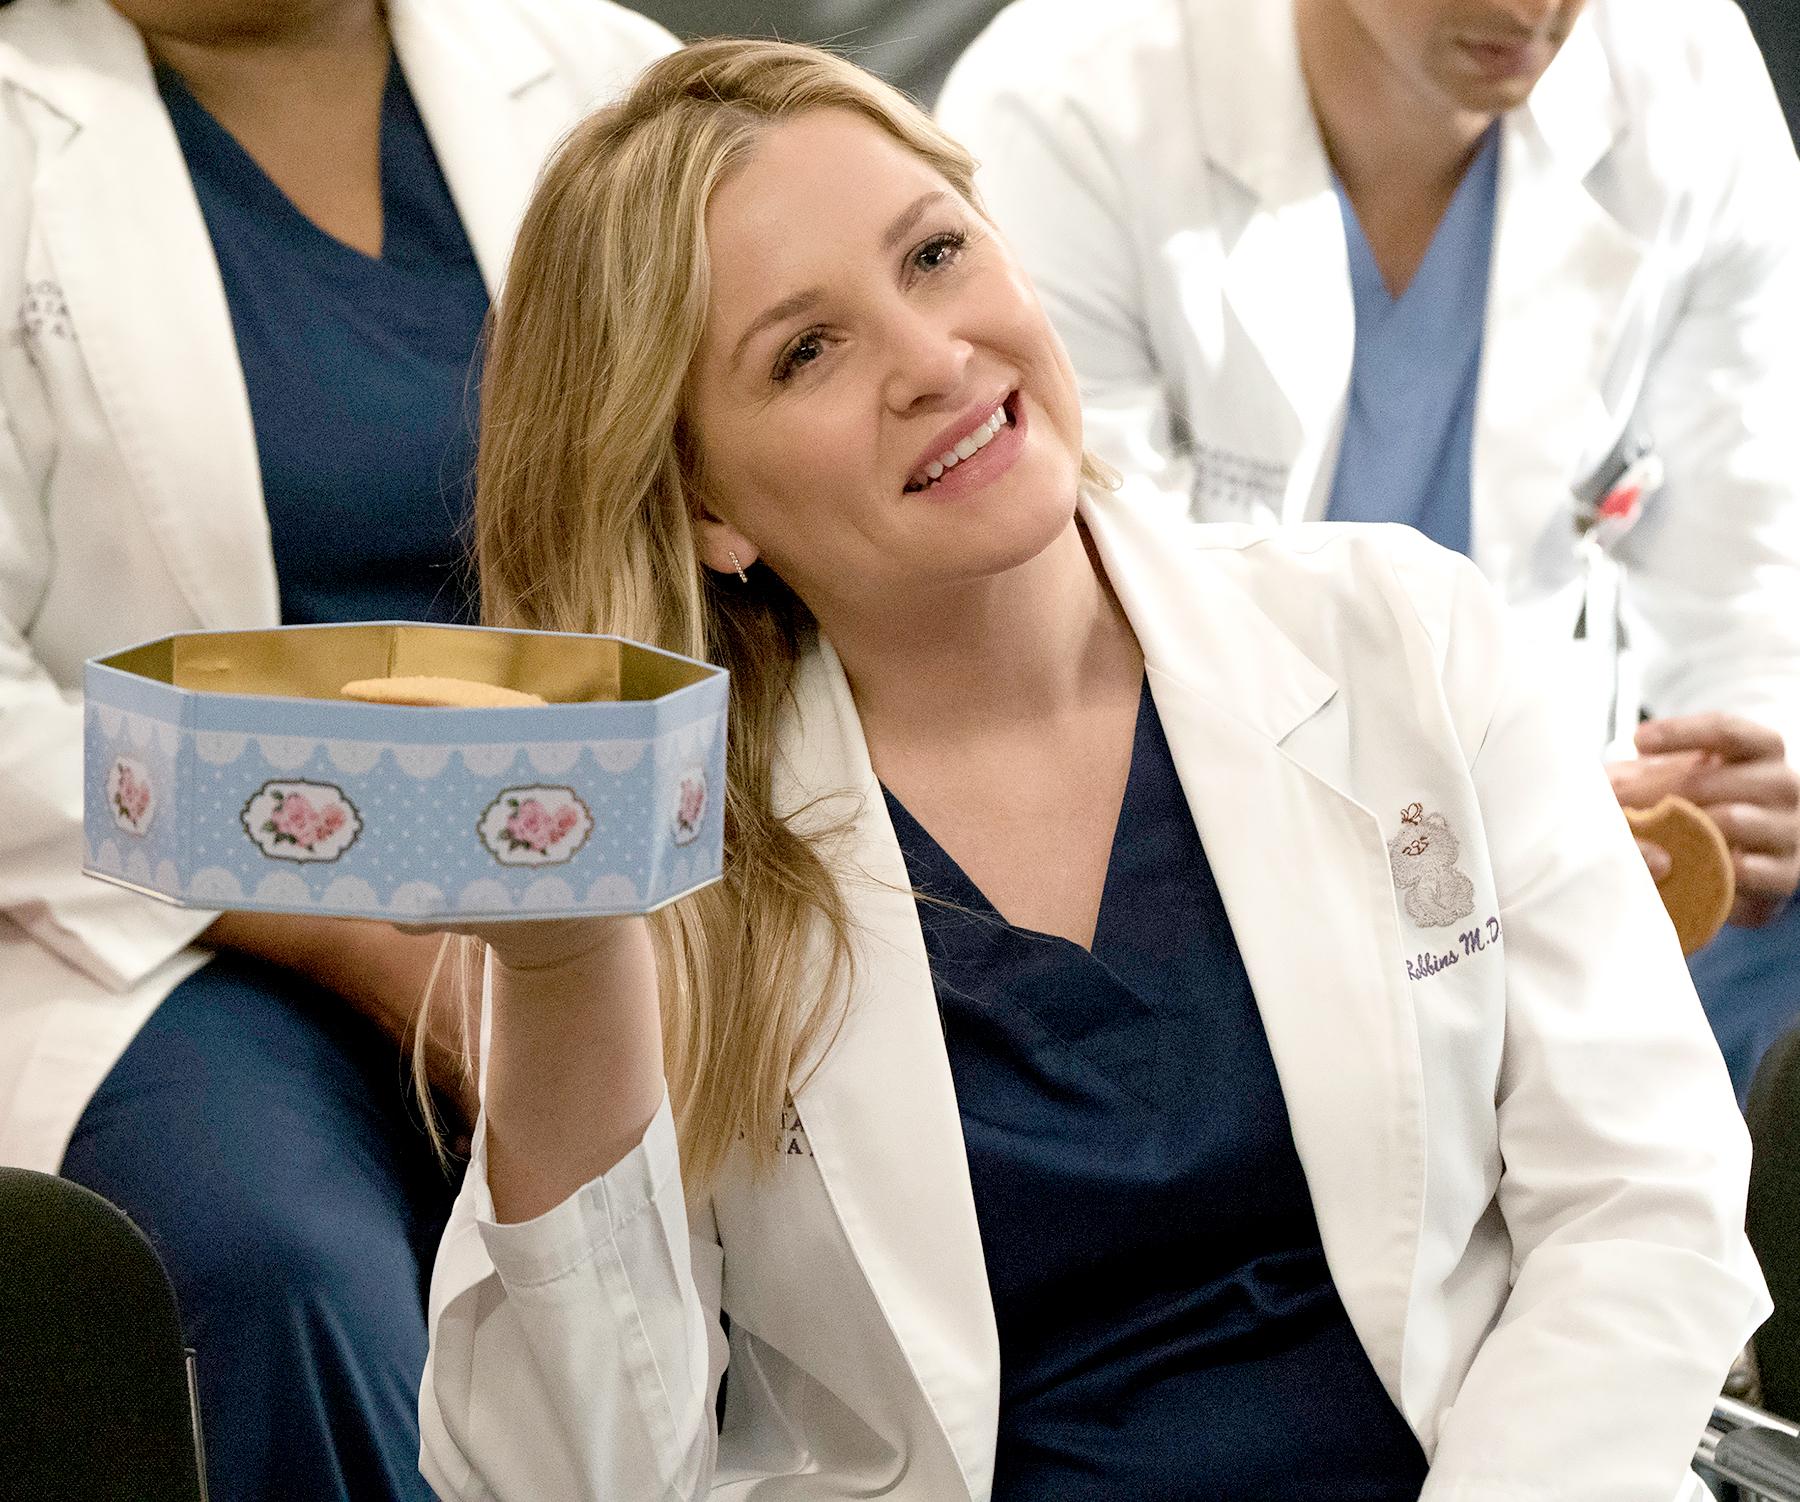 Jessica Capshaw Tweets About Last Day at 'Grey's Anatomy' Studio